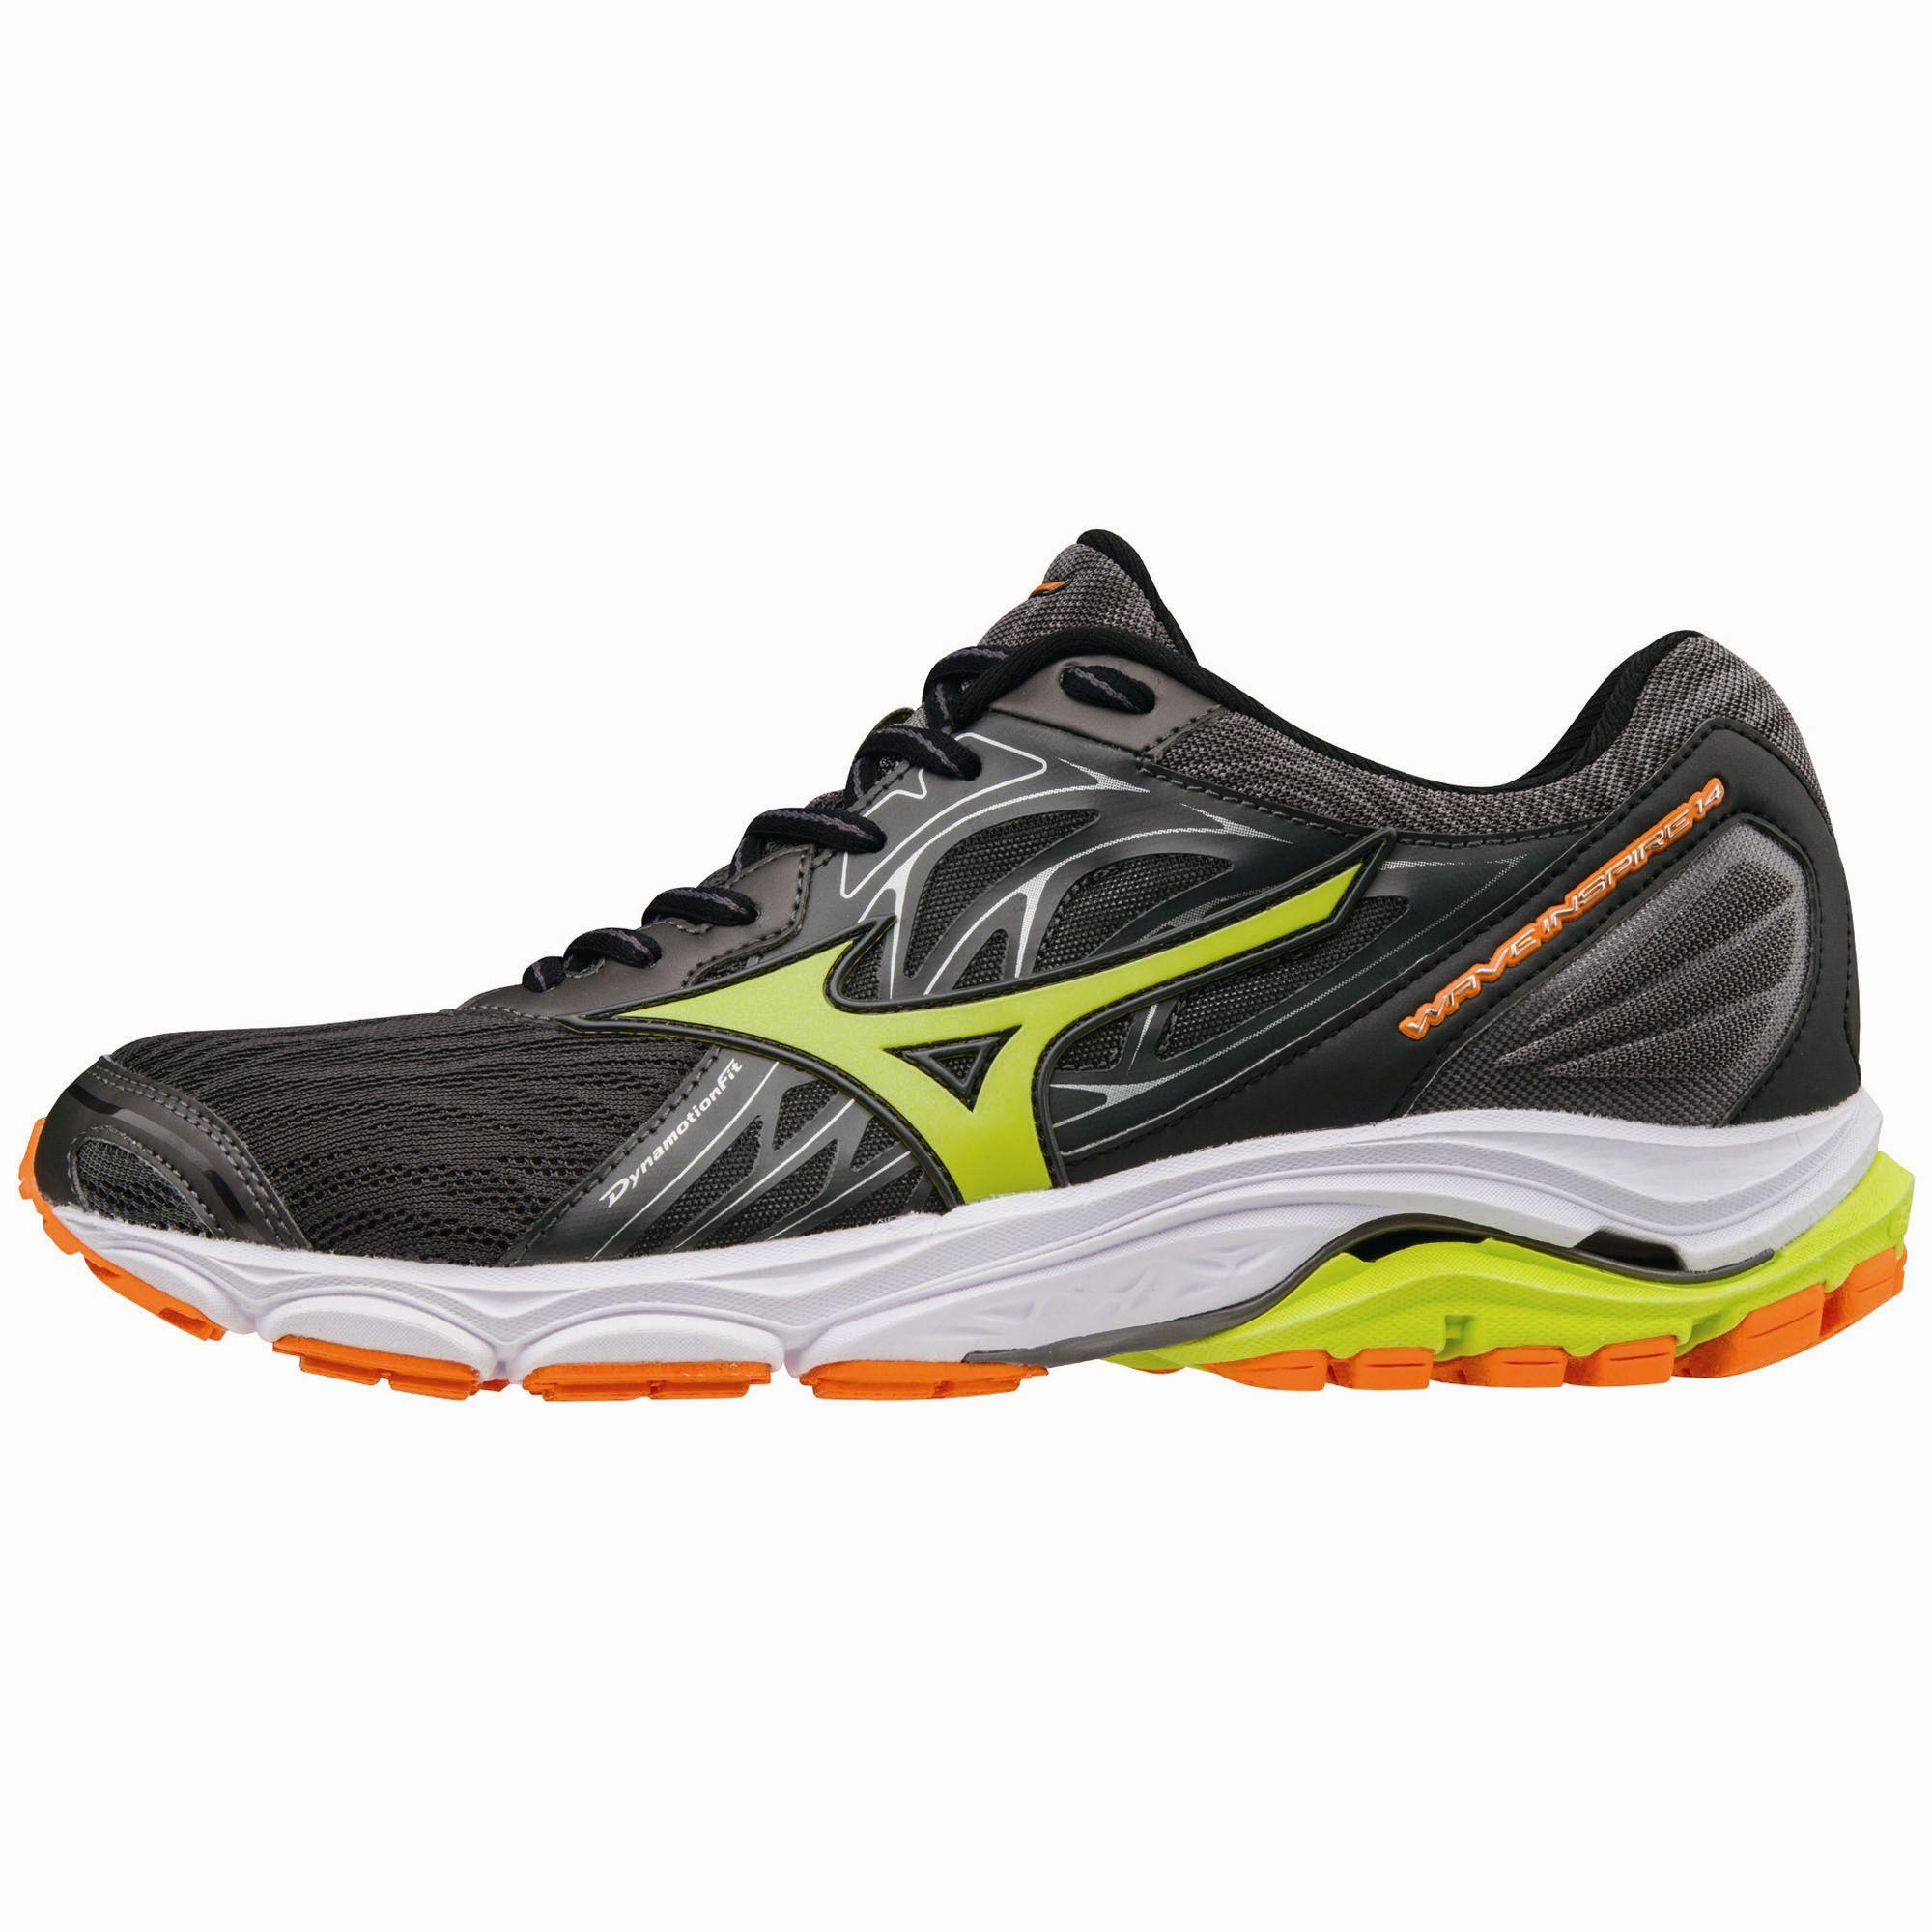 Mizuno Wave Inspire Mens Running Shoes